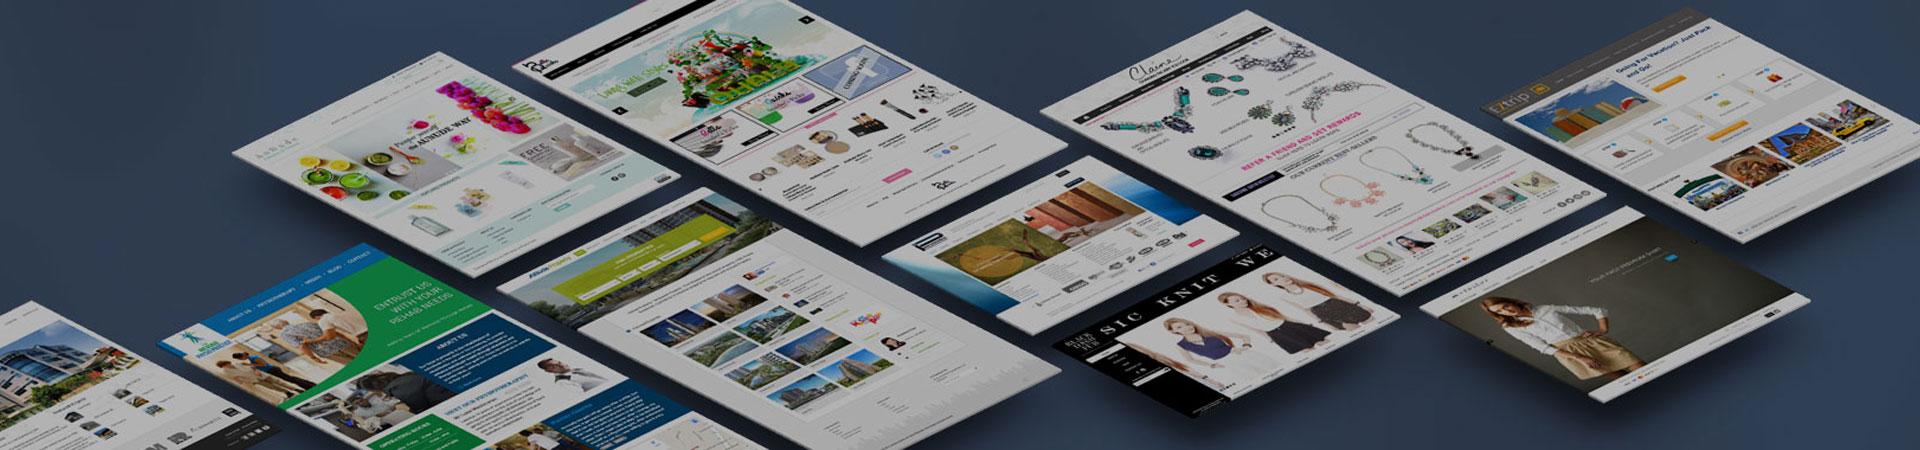 Website Design Singapore - EZTrip Online